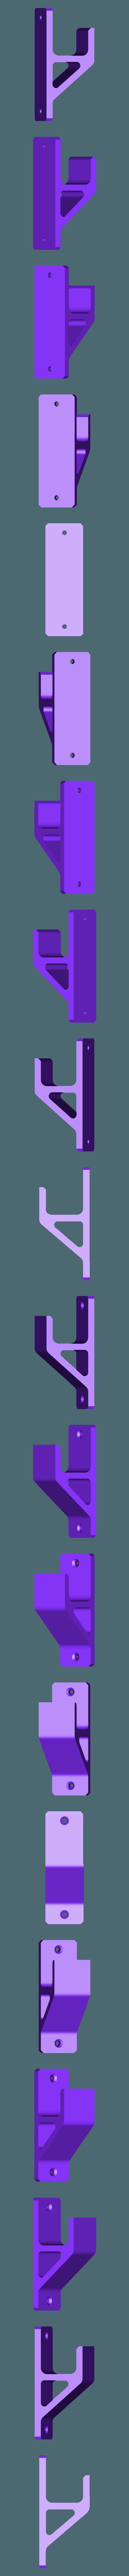 Schraubzwingehalter-klein.STL Descargar archivo STL gratis Schraubzwingenhalter / Soporte de abrazadera de tornillo • Diseño para imprimir en 3D, Chileo